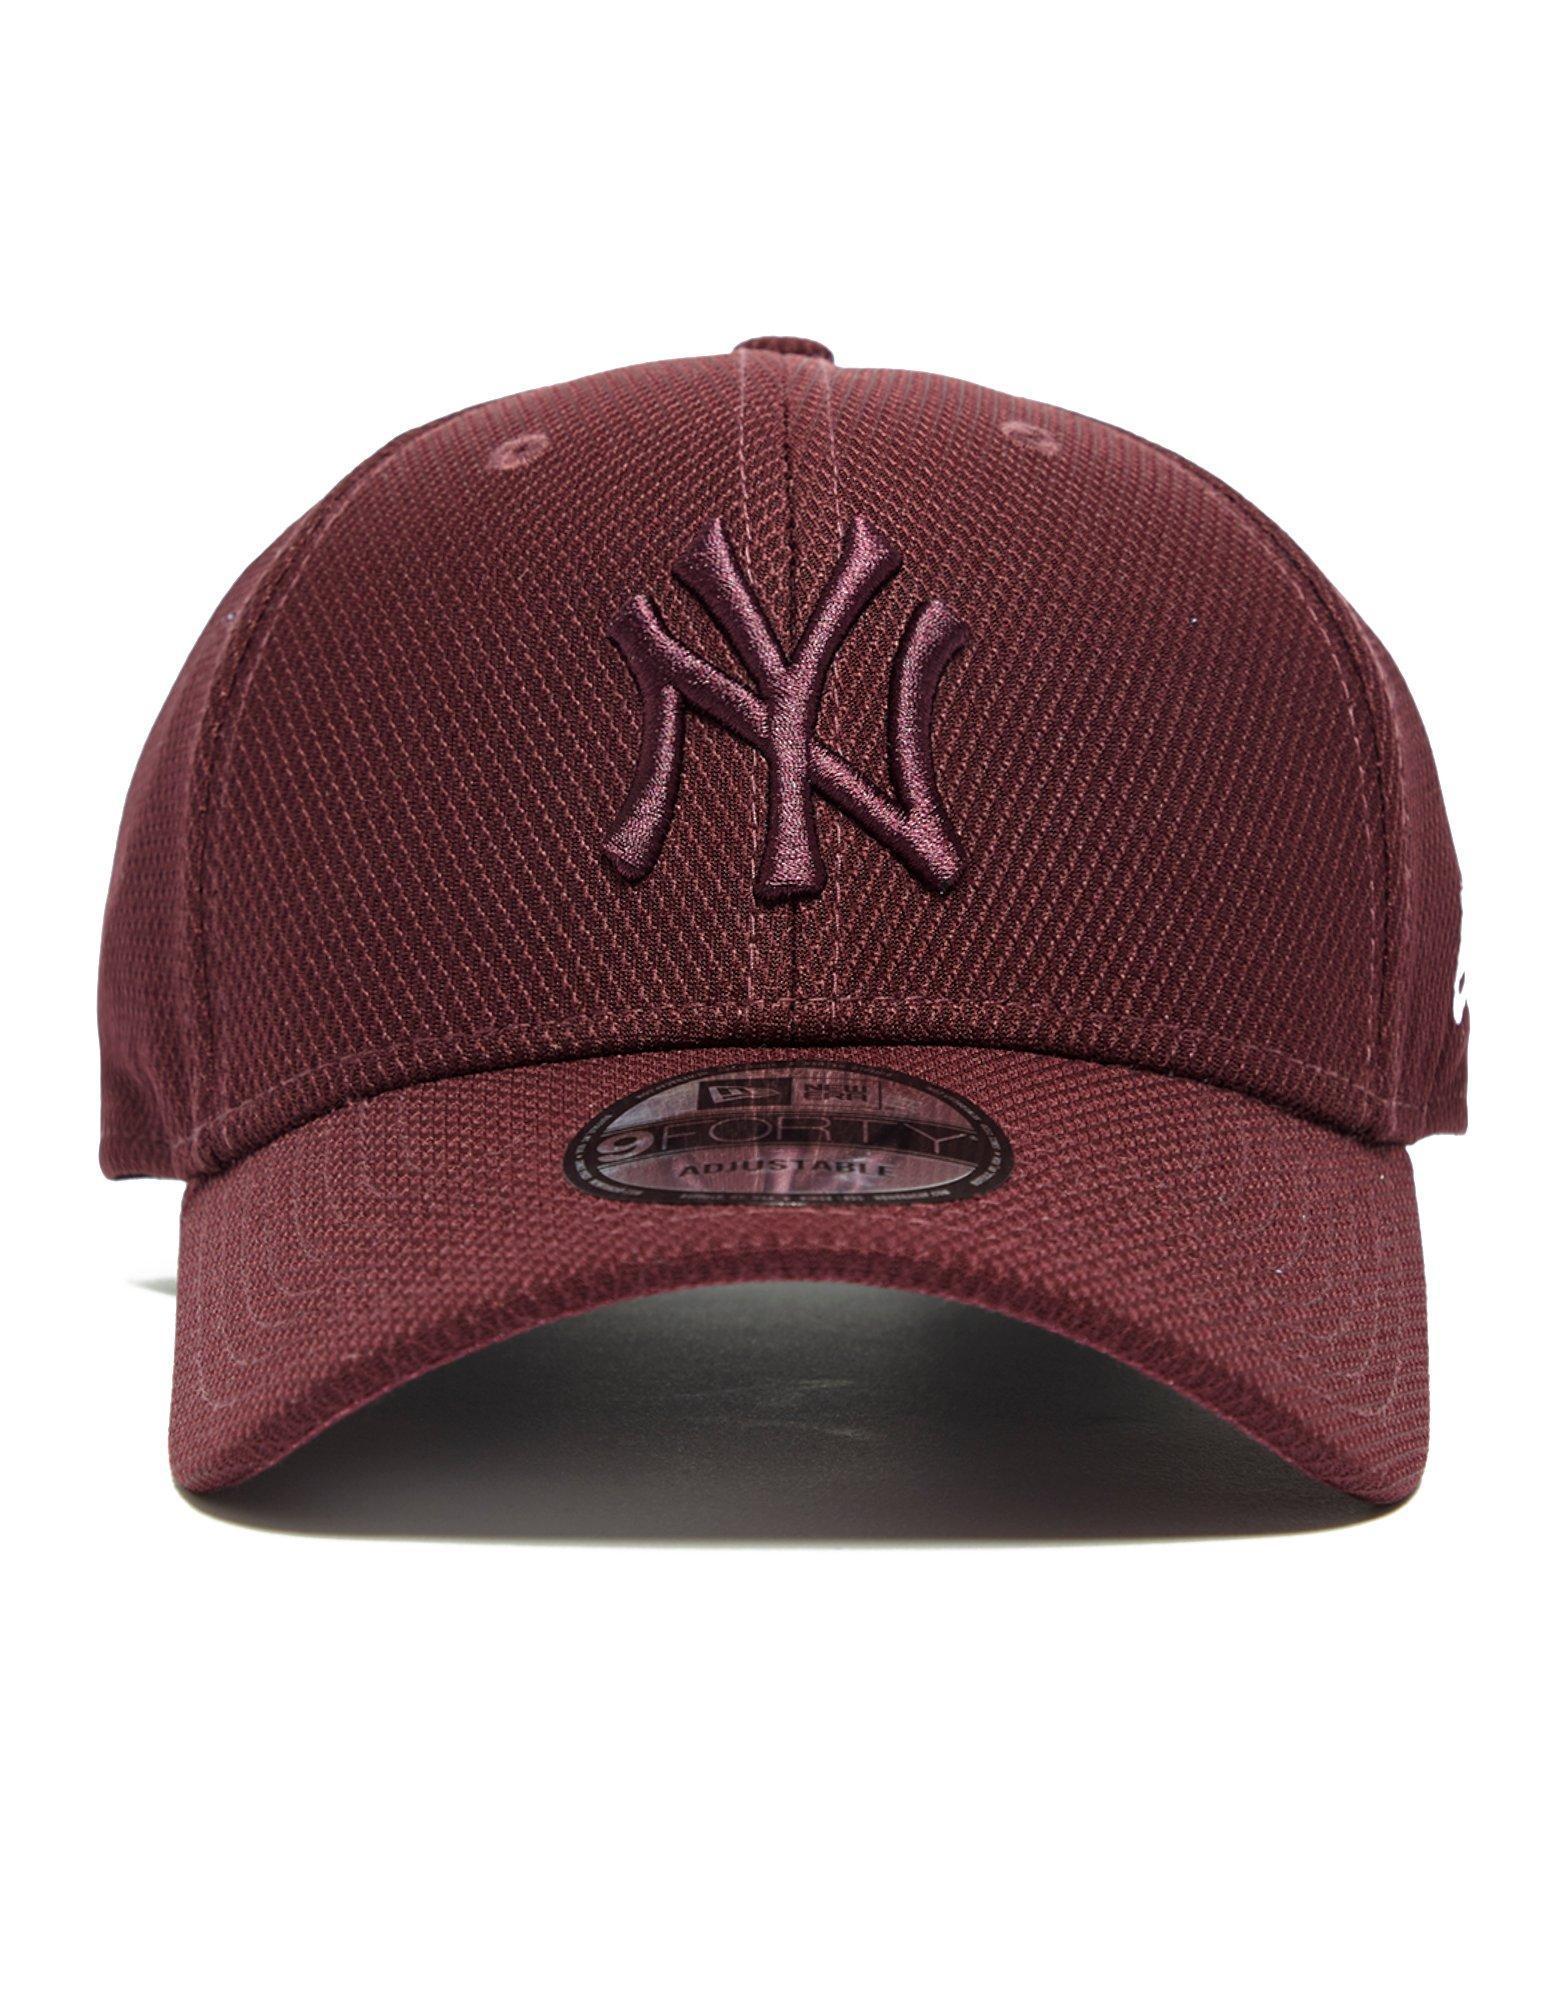 7d1c6f30908 Lyst - Ktz 9forty New York Yankees Baseball Cap in Red for Men